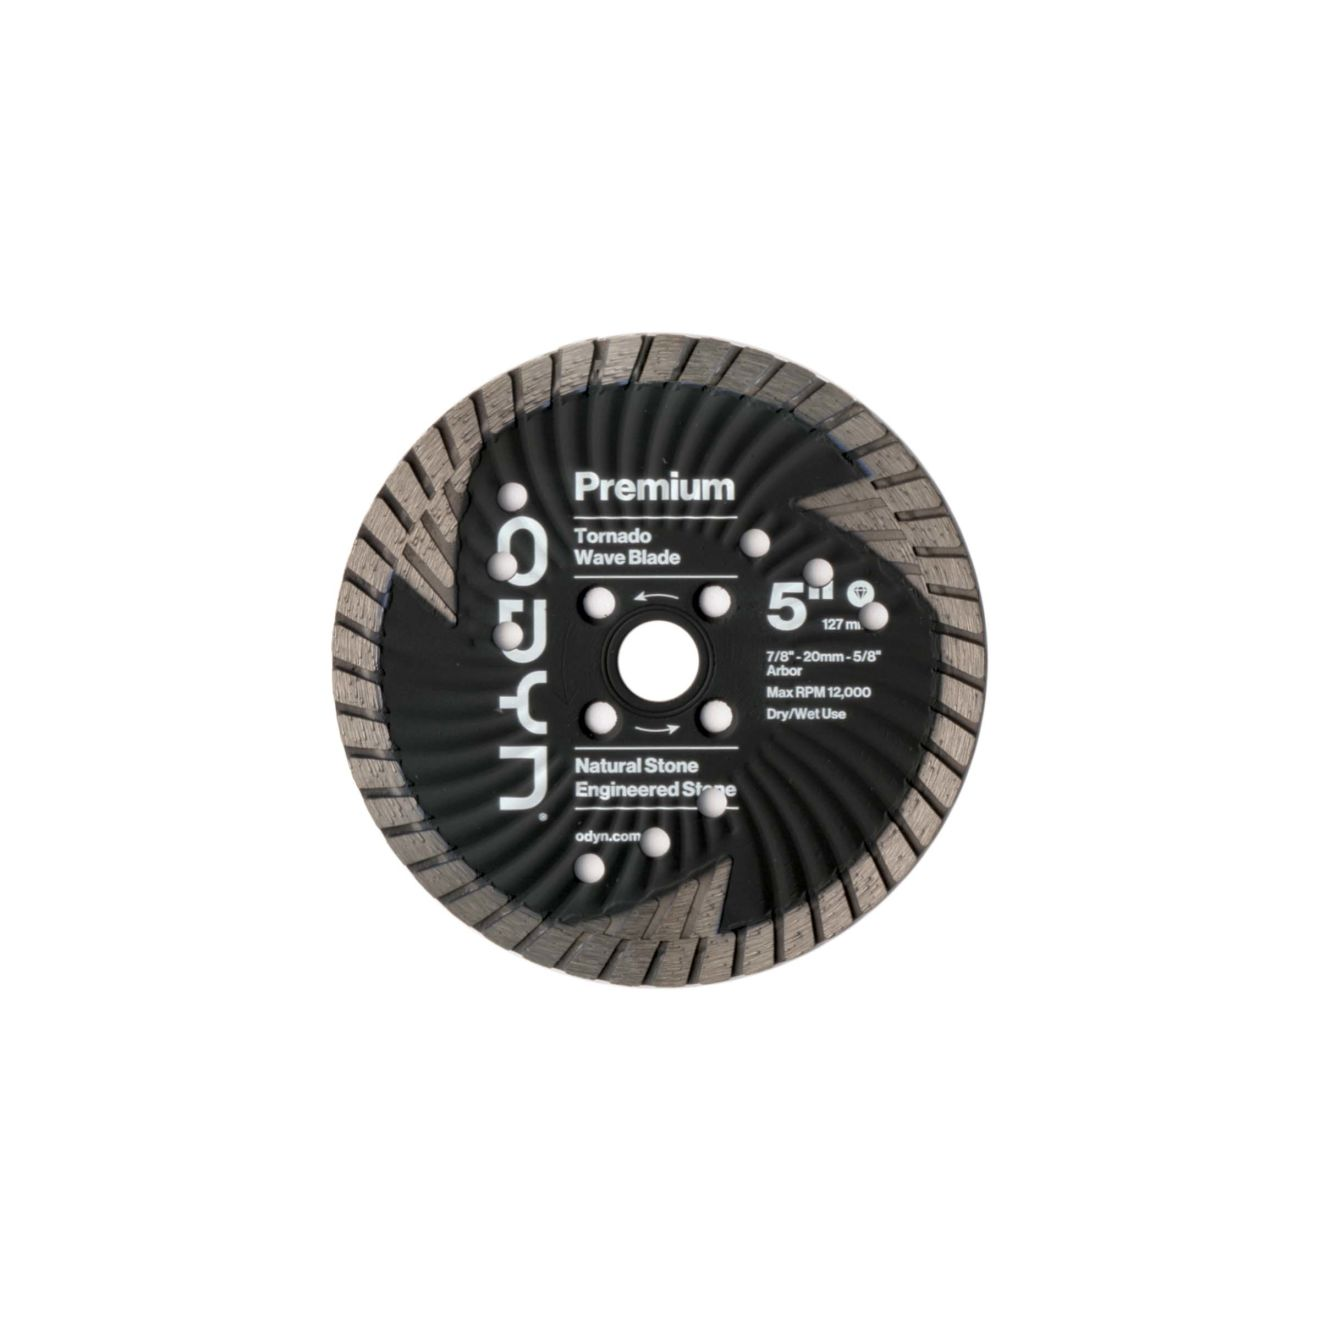 Odyn 5 in. Premium Tornado Wave Blade